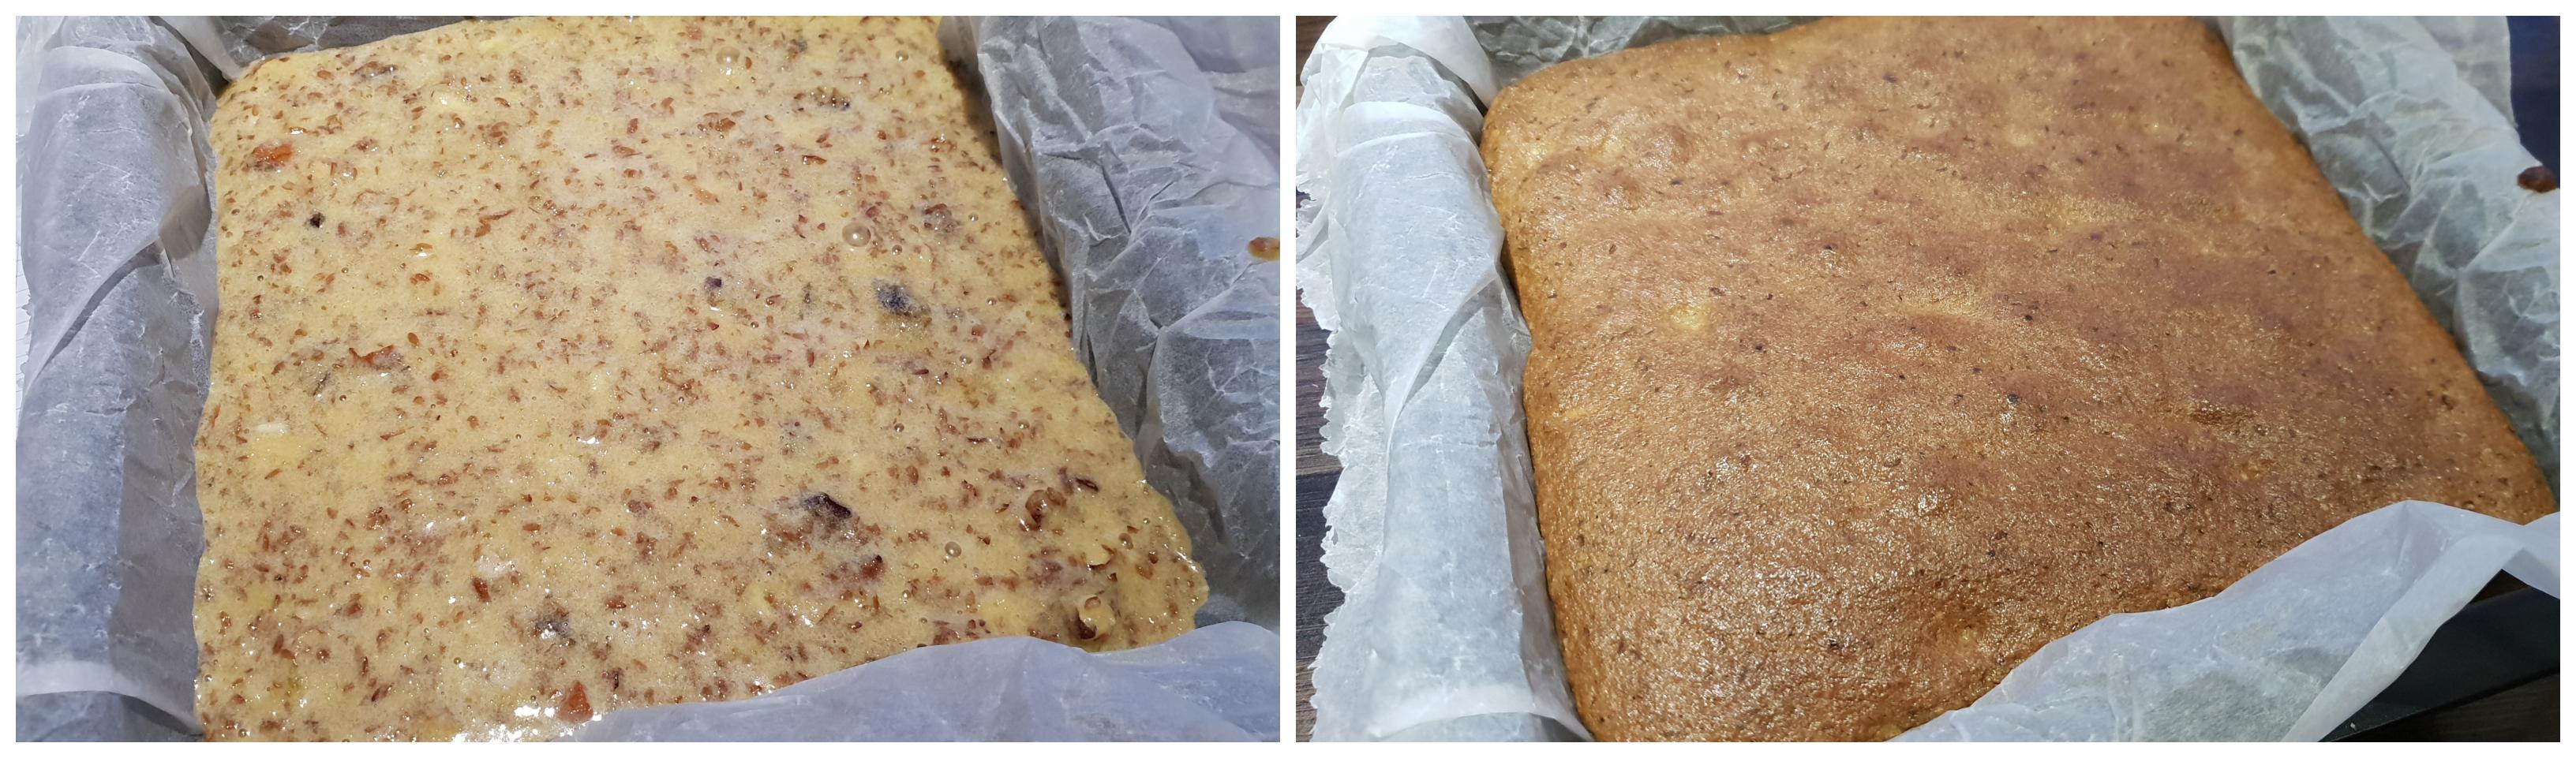 Dadel Amandel Cake - bakken